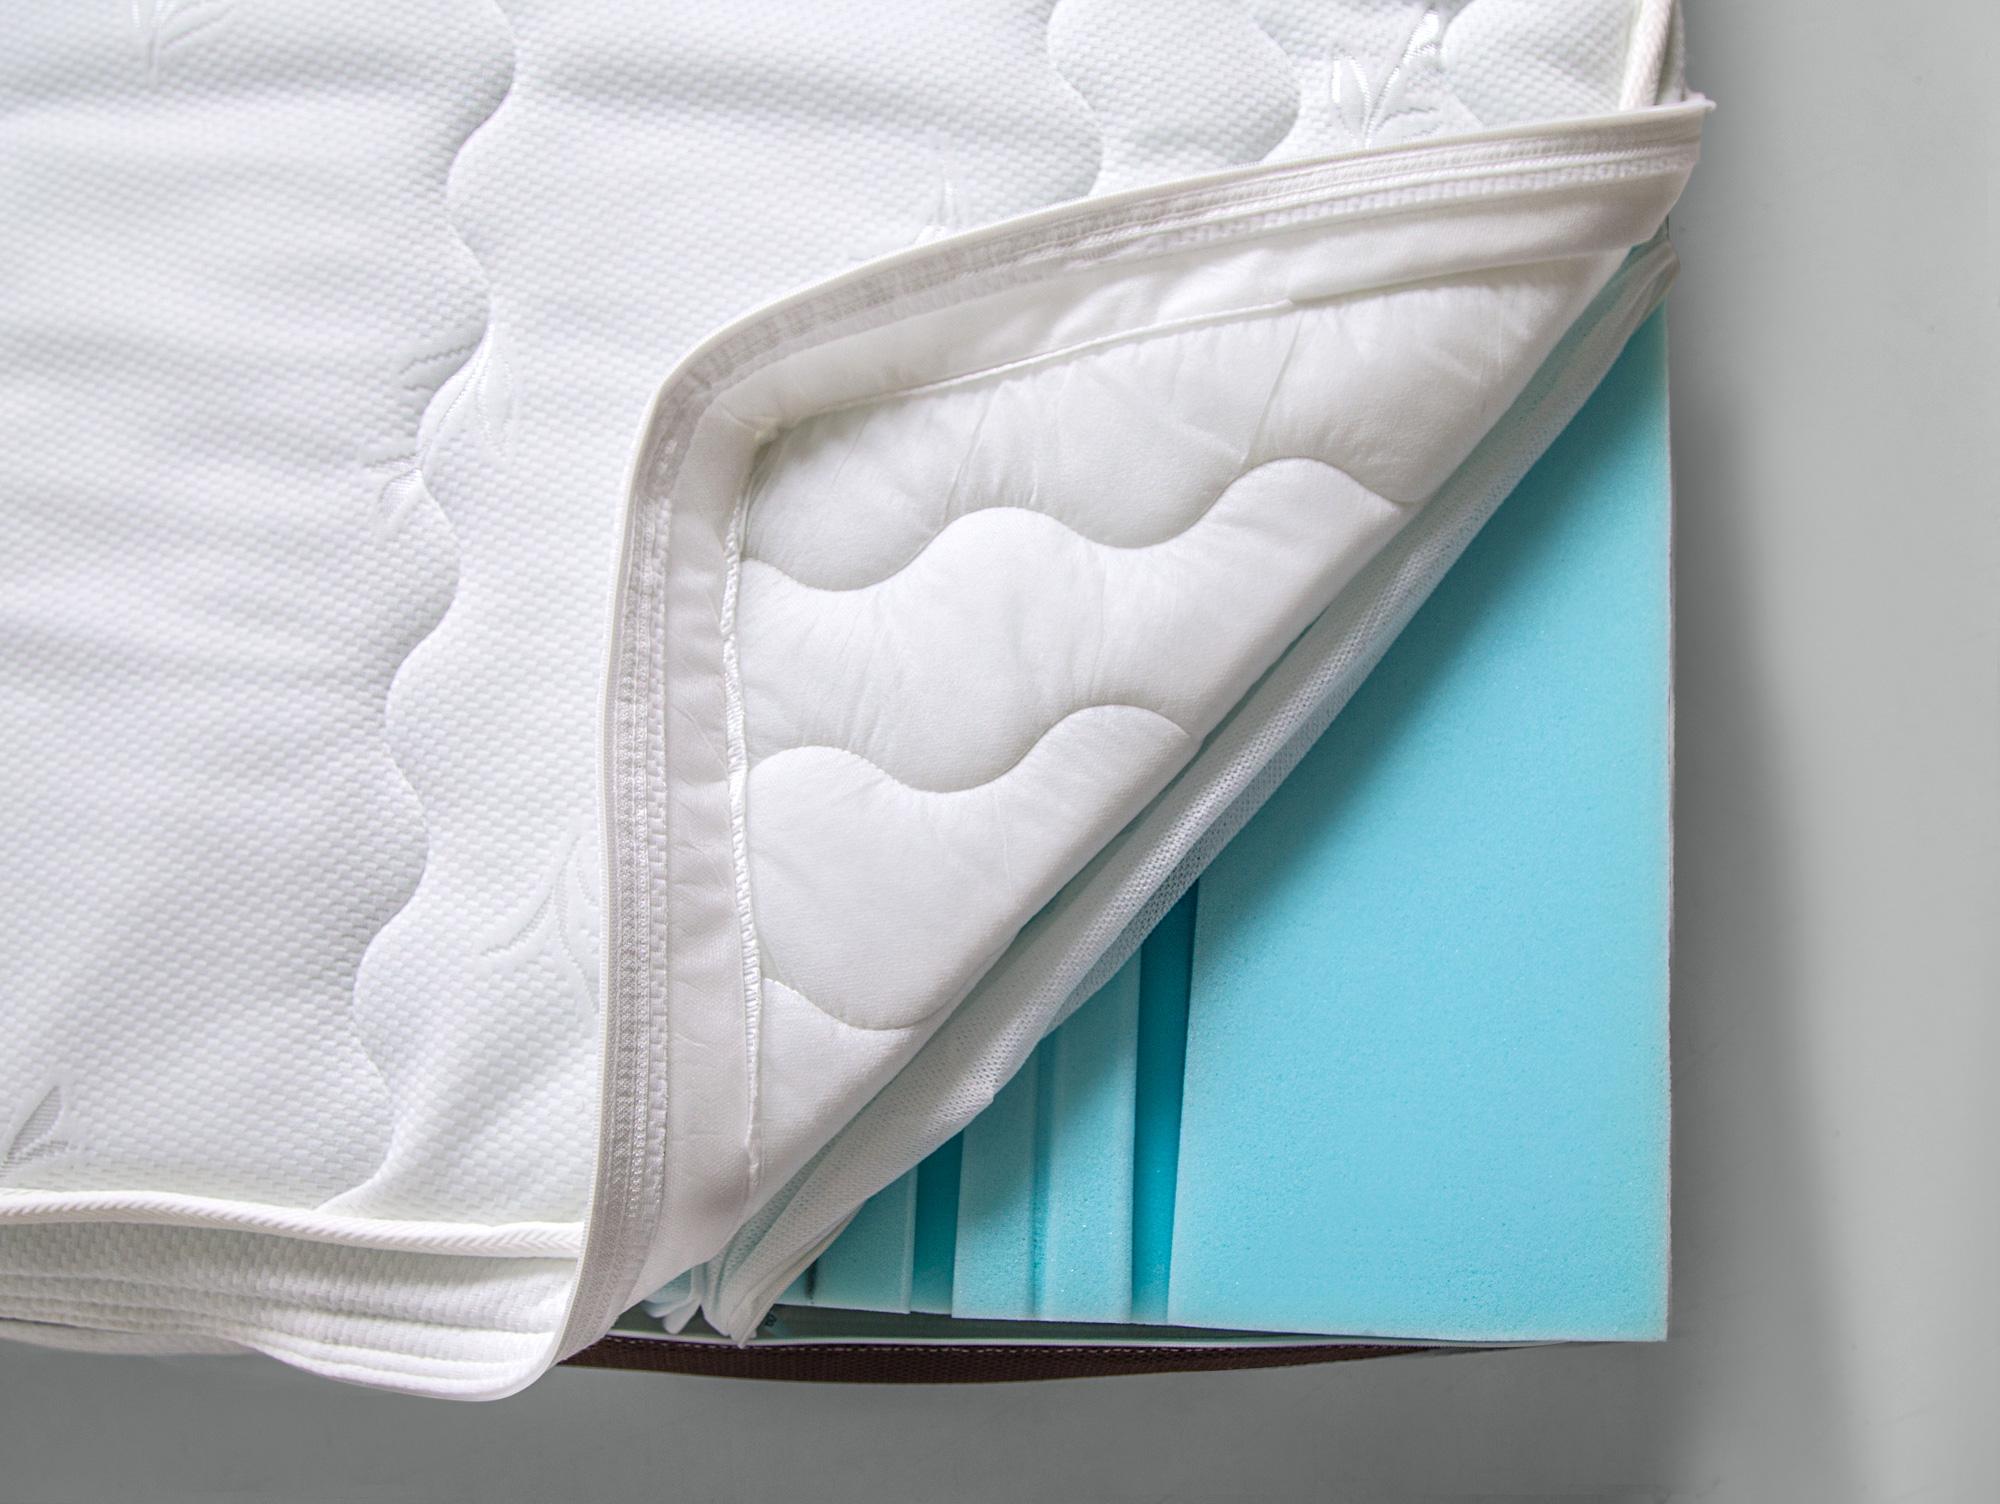 deluxe foam kaltschaummatratze 80 x 200 cm h rtegrad 3. Black Bedroom Furniture Sets. Home Design Ideas